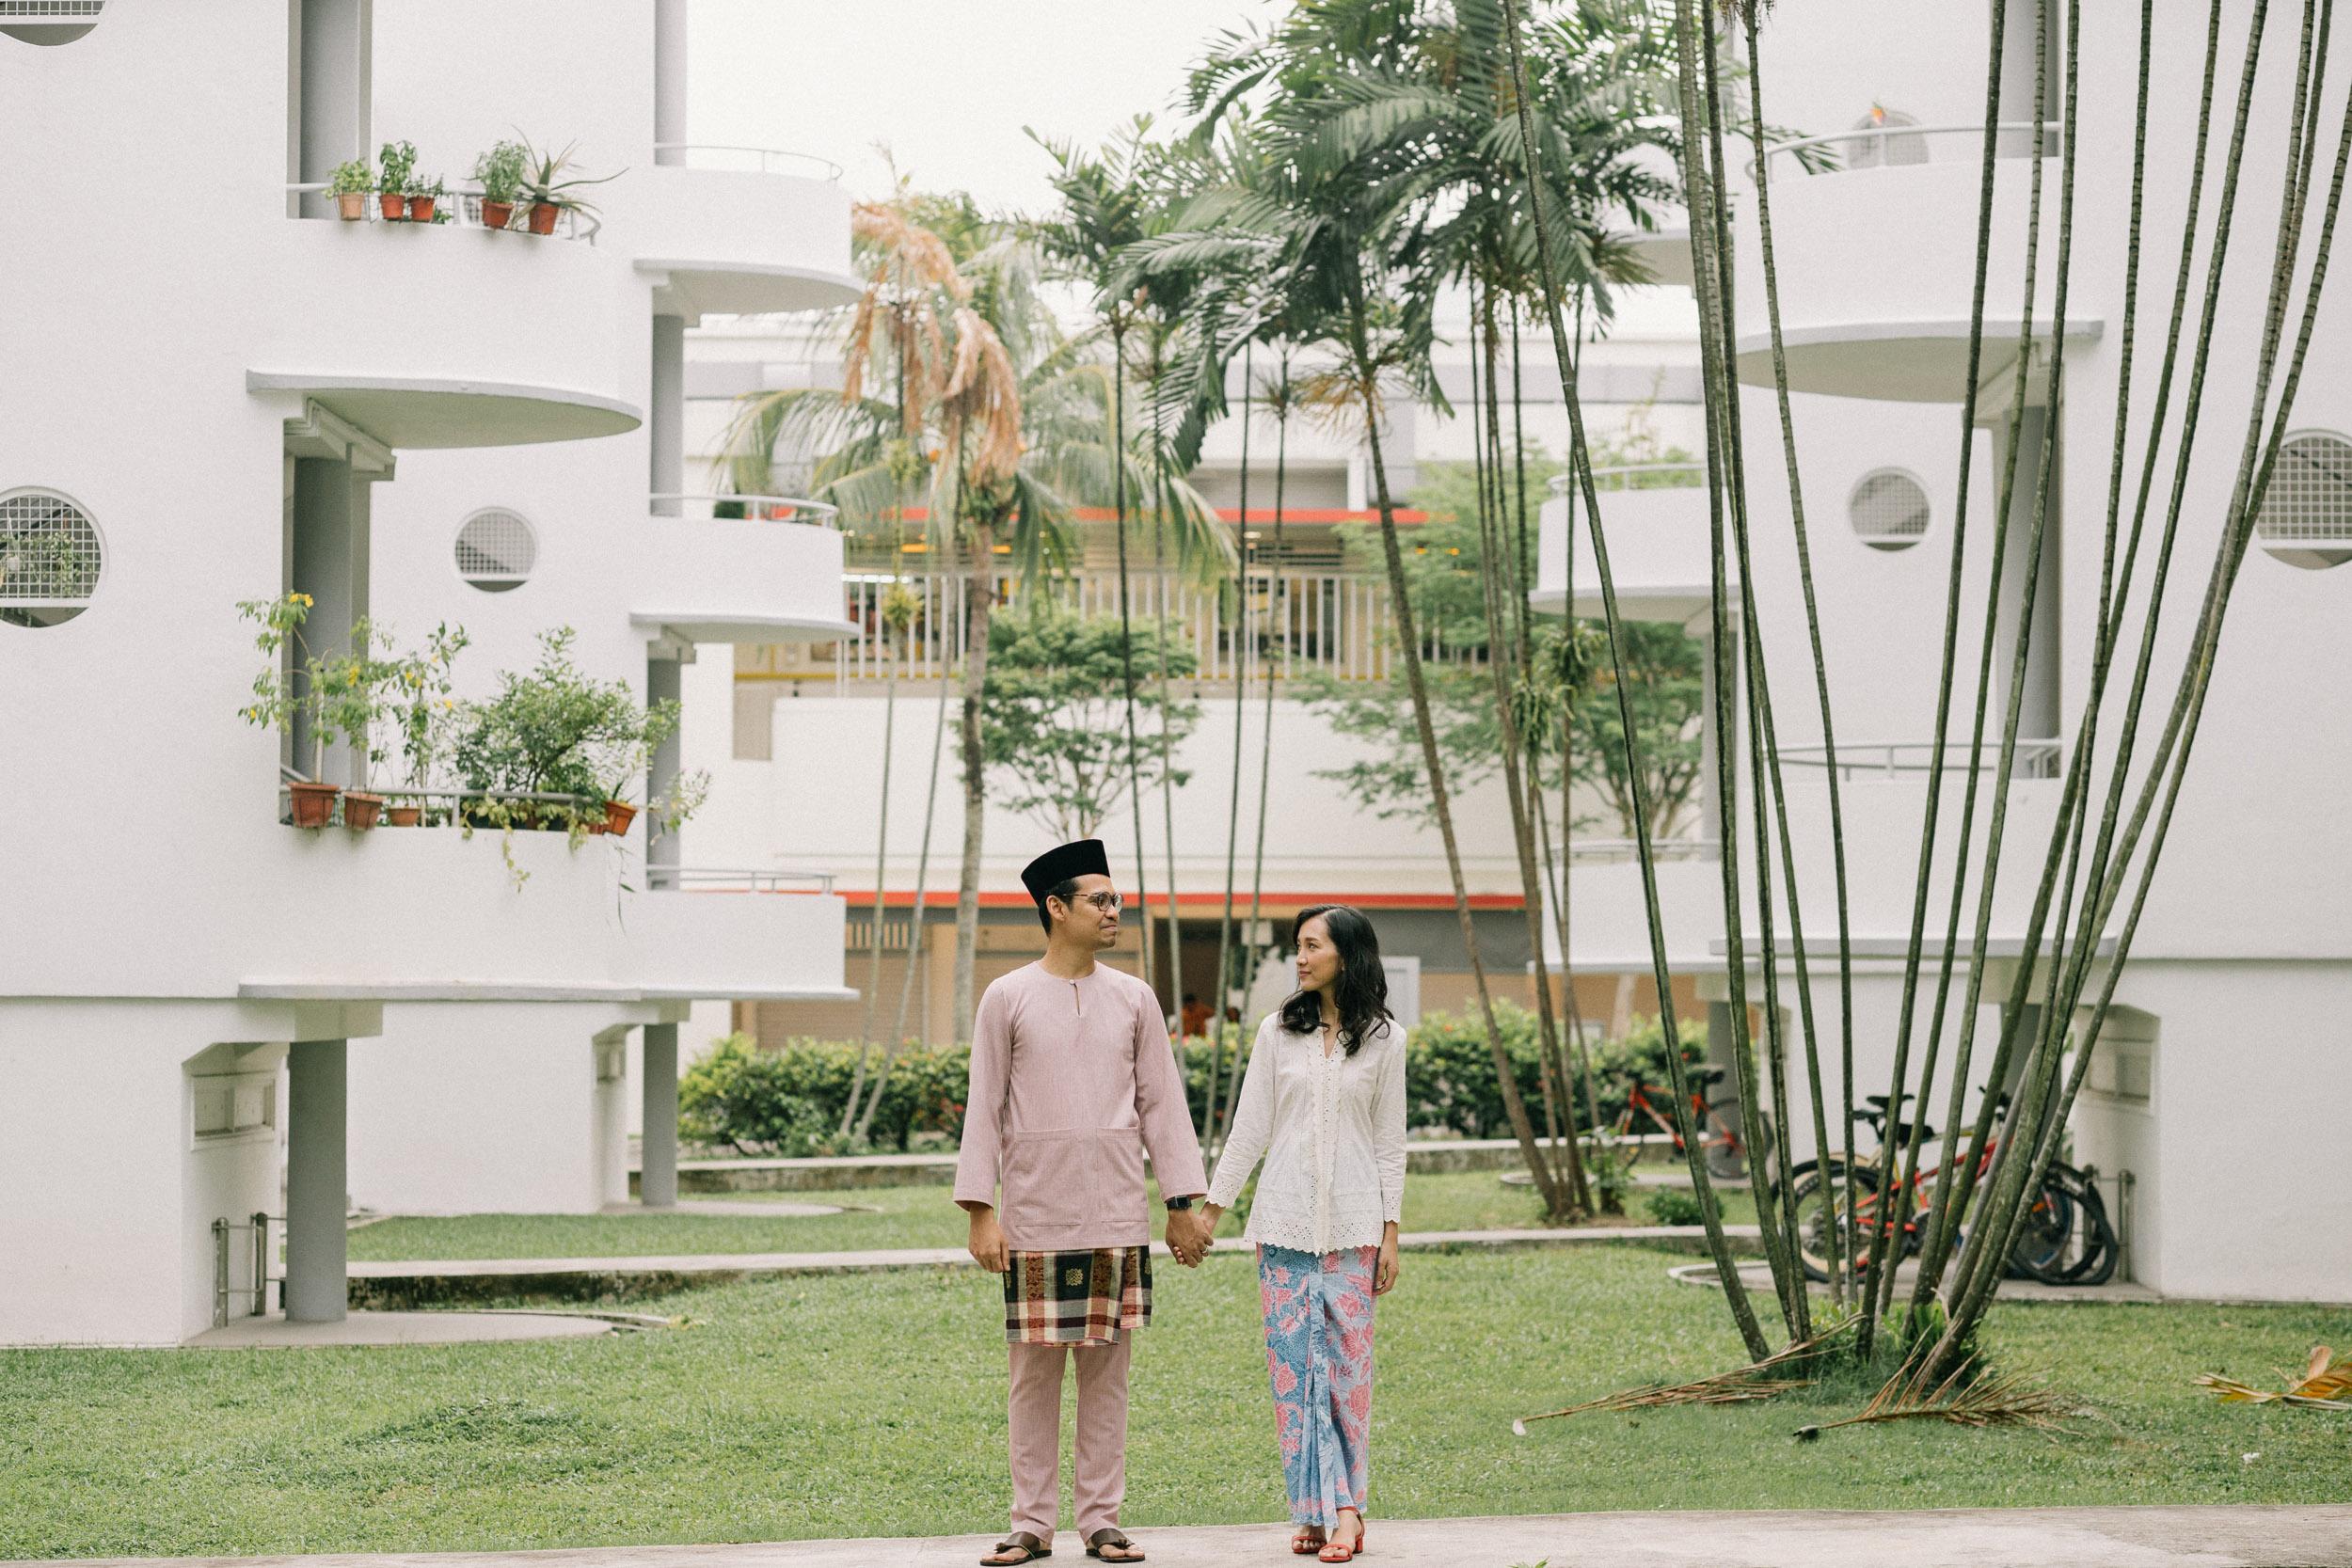 singapore-wedding-photographer-wemadethese-adib-mizah-16.jpg